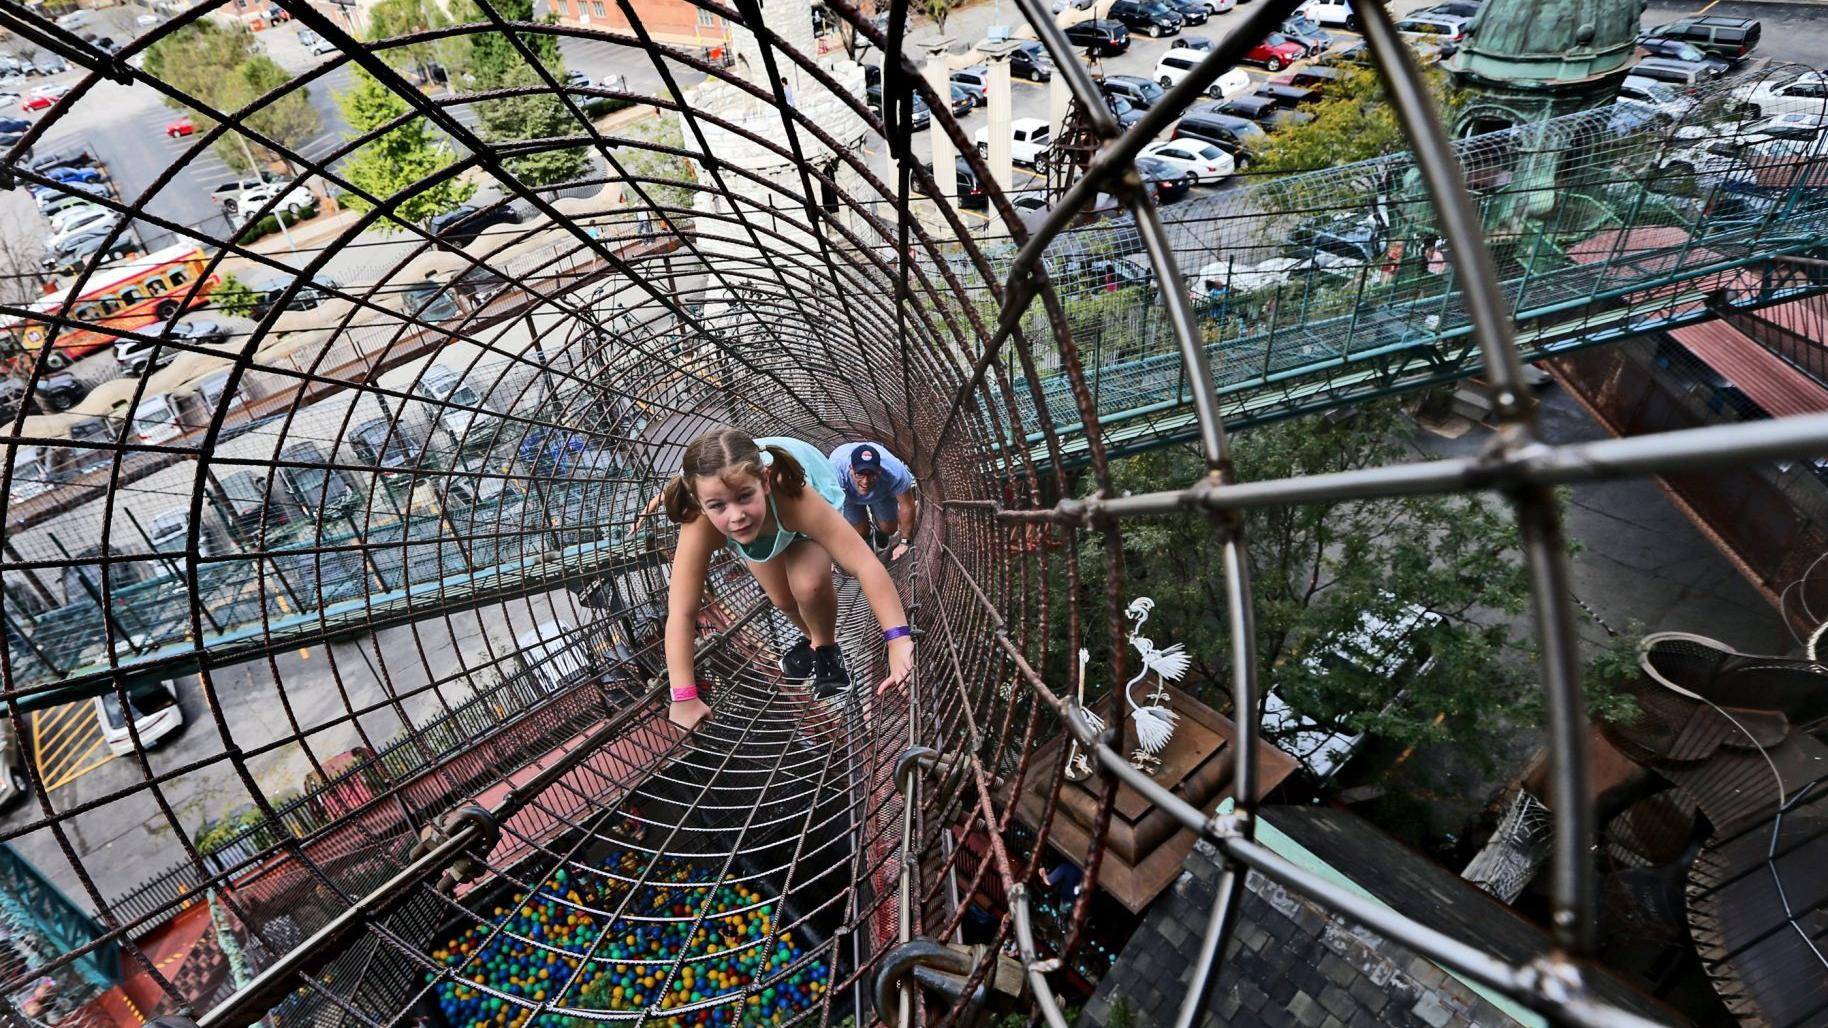 City Museum celebrates 20 years of 'organized crazy'